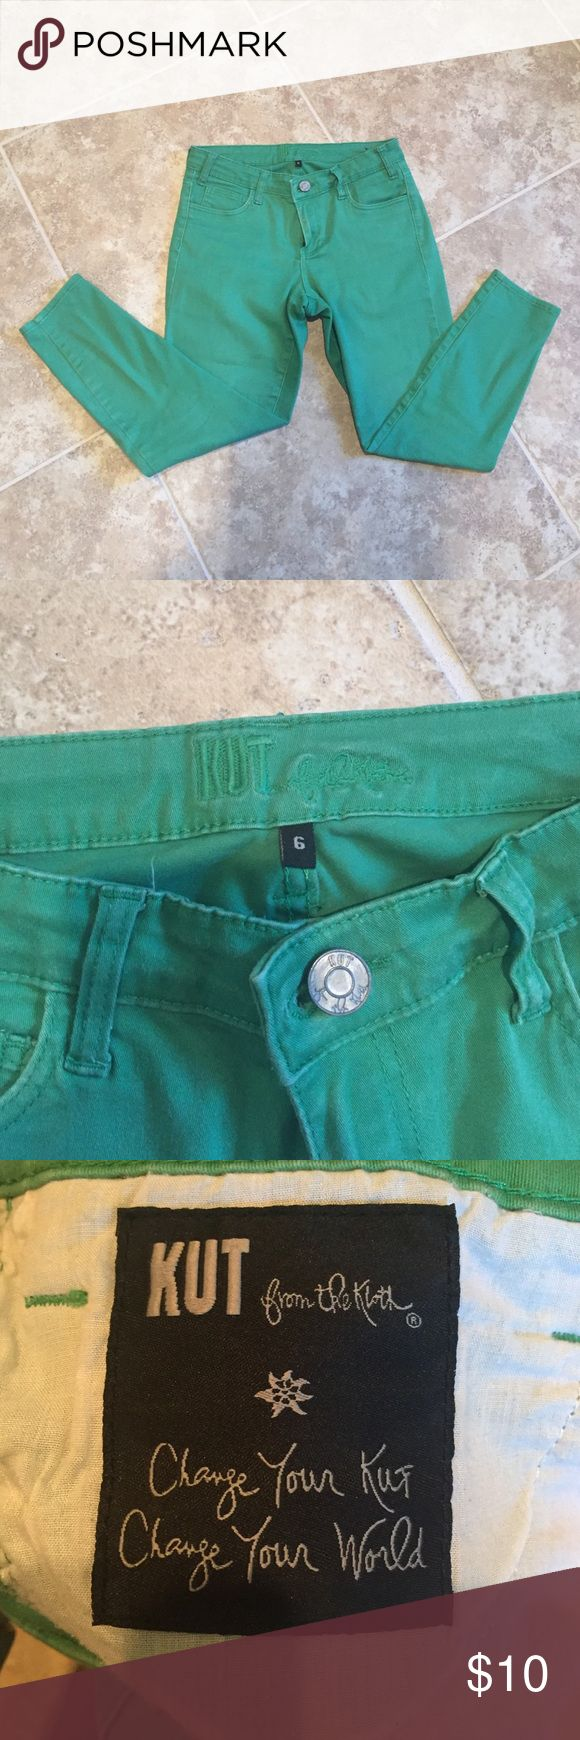 Kut Green Skinny Jeans Kut from the Kloth Green Skinny Jeans, size 6 **10% off bundles of 2+** Kut from the Kloth Jeans Skinny